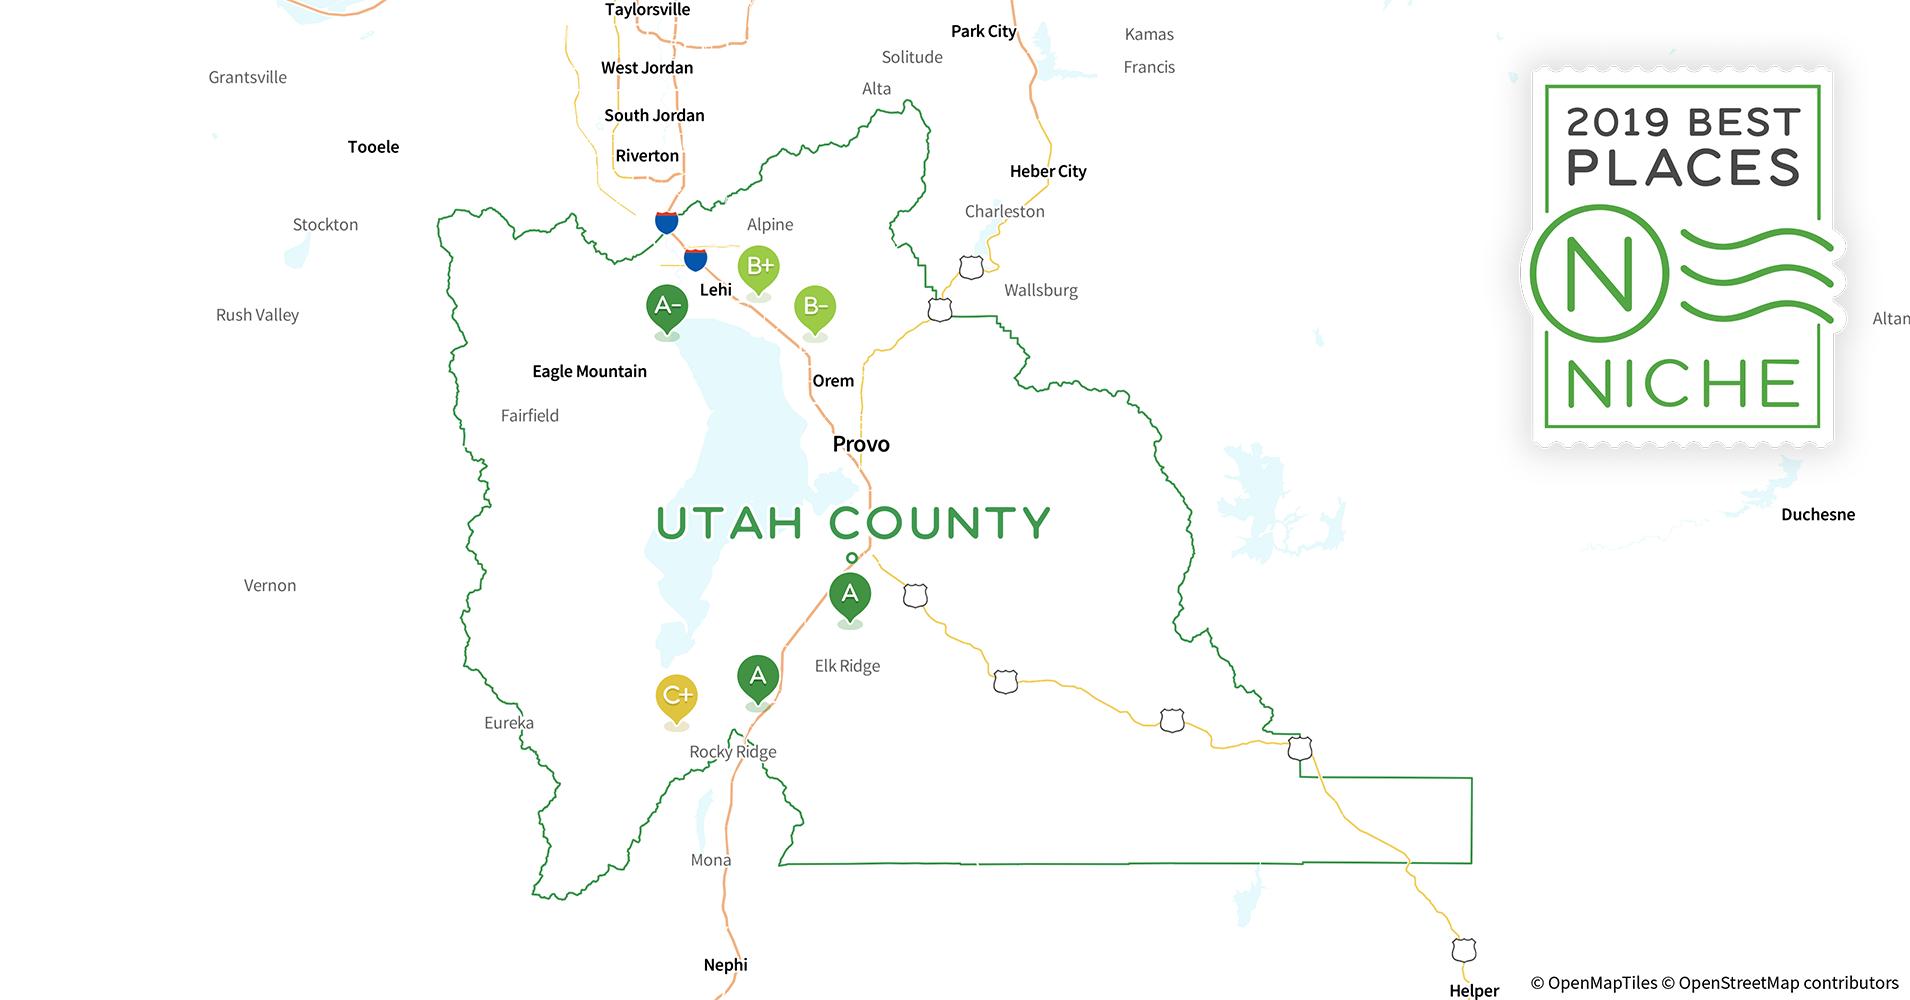 Orem Utah Zip Code Map.2019 Best Places To Live In Utah County Ut Niche